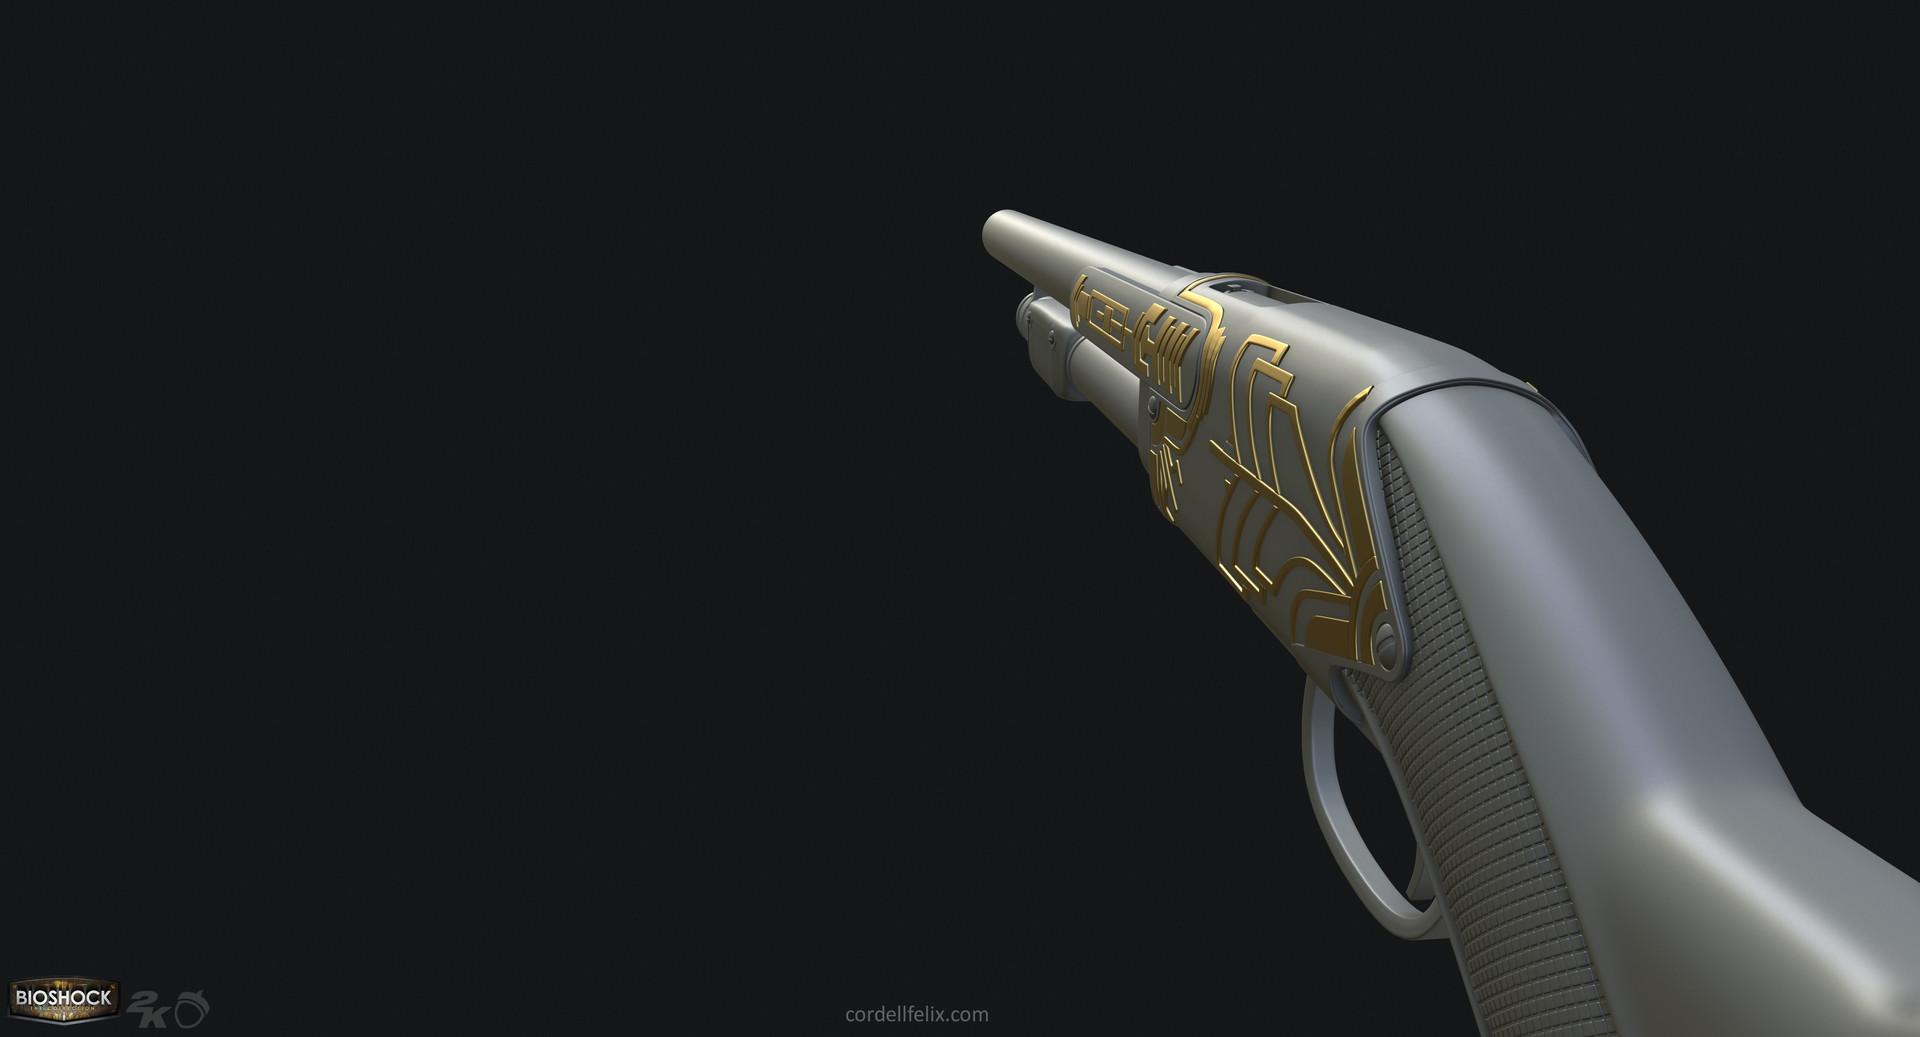 Cordell felix cordellfelix bioshock shotgun hp 02